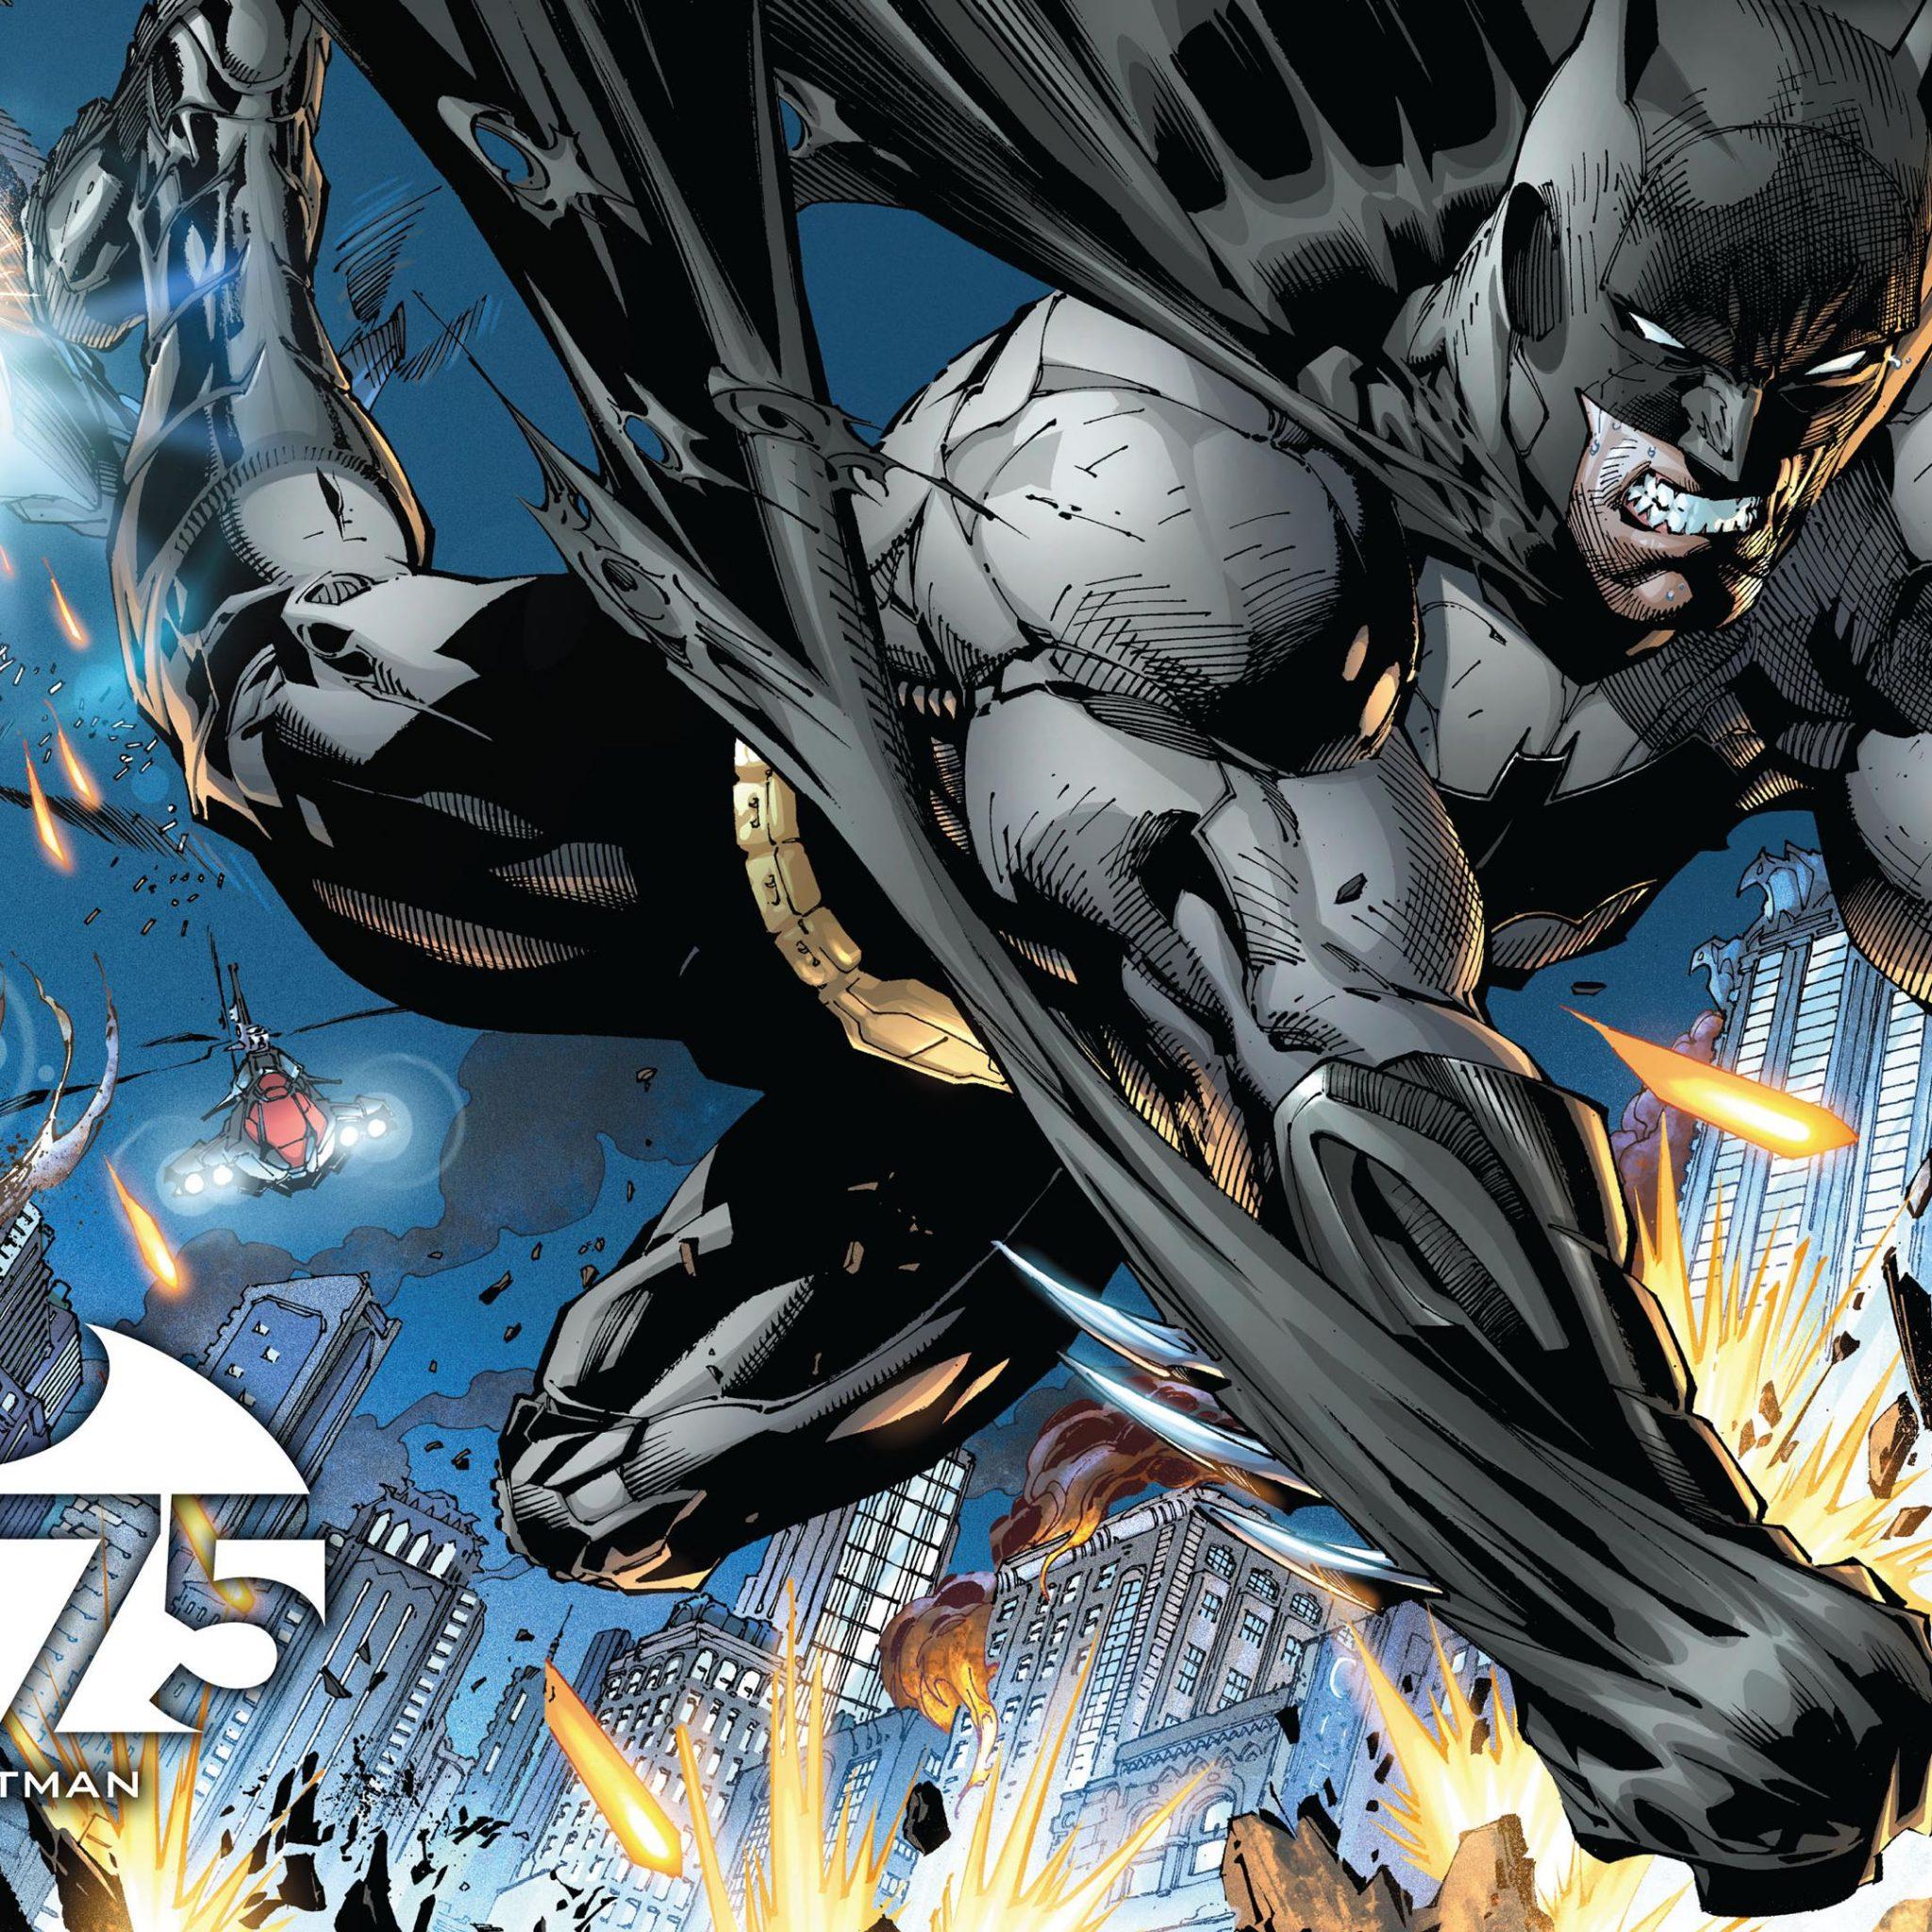 Deadpool Hd Wallpaper Iphone 75 Years Of Batman Dc Comics 4k Uhd Wallpaper